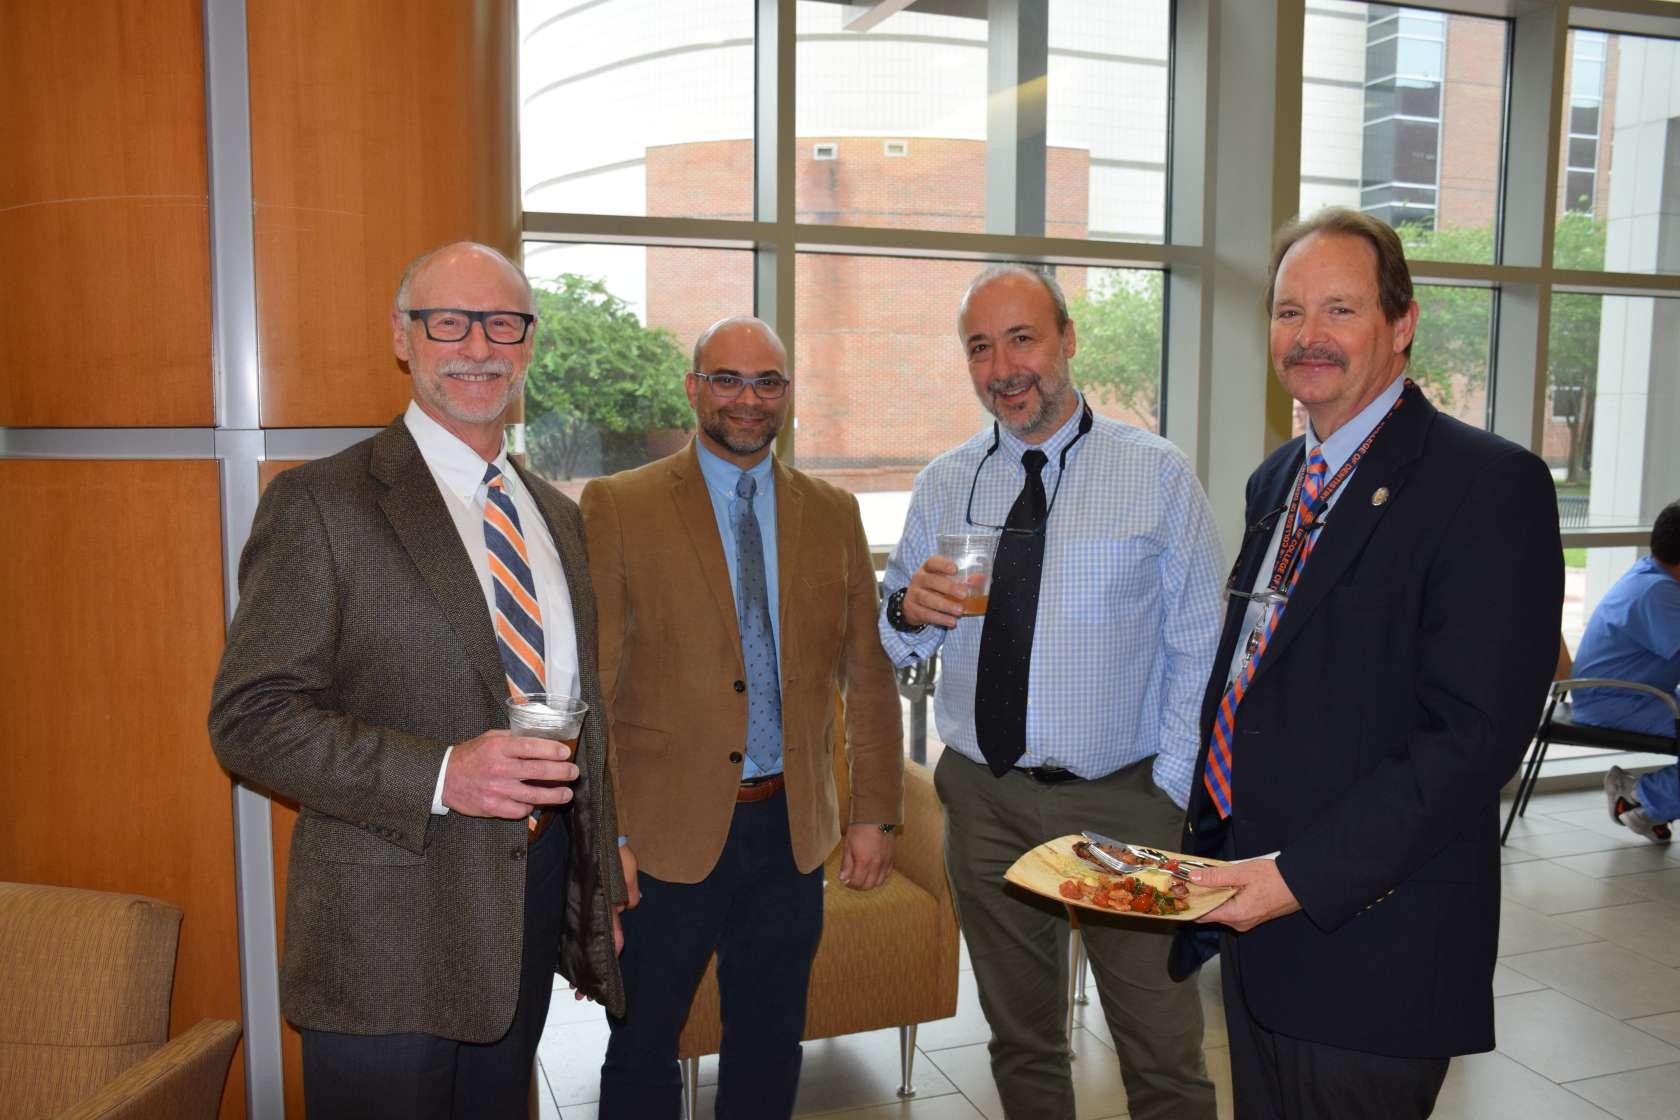 (l to r) Drs. Joe Riley, Alex Delgado, Panos Zoidis & Steve Howard enjoy a UFCD Spotlight on Dental Education Awards Ceremony.